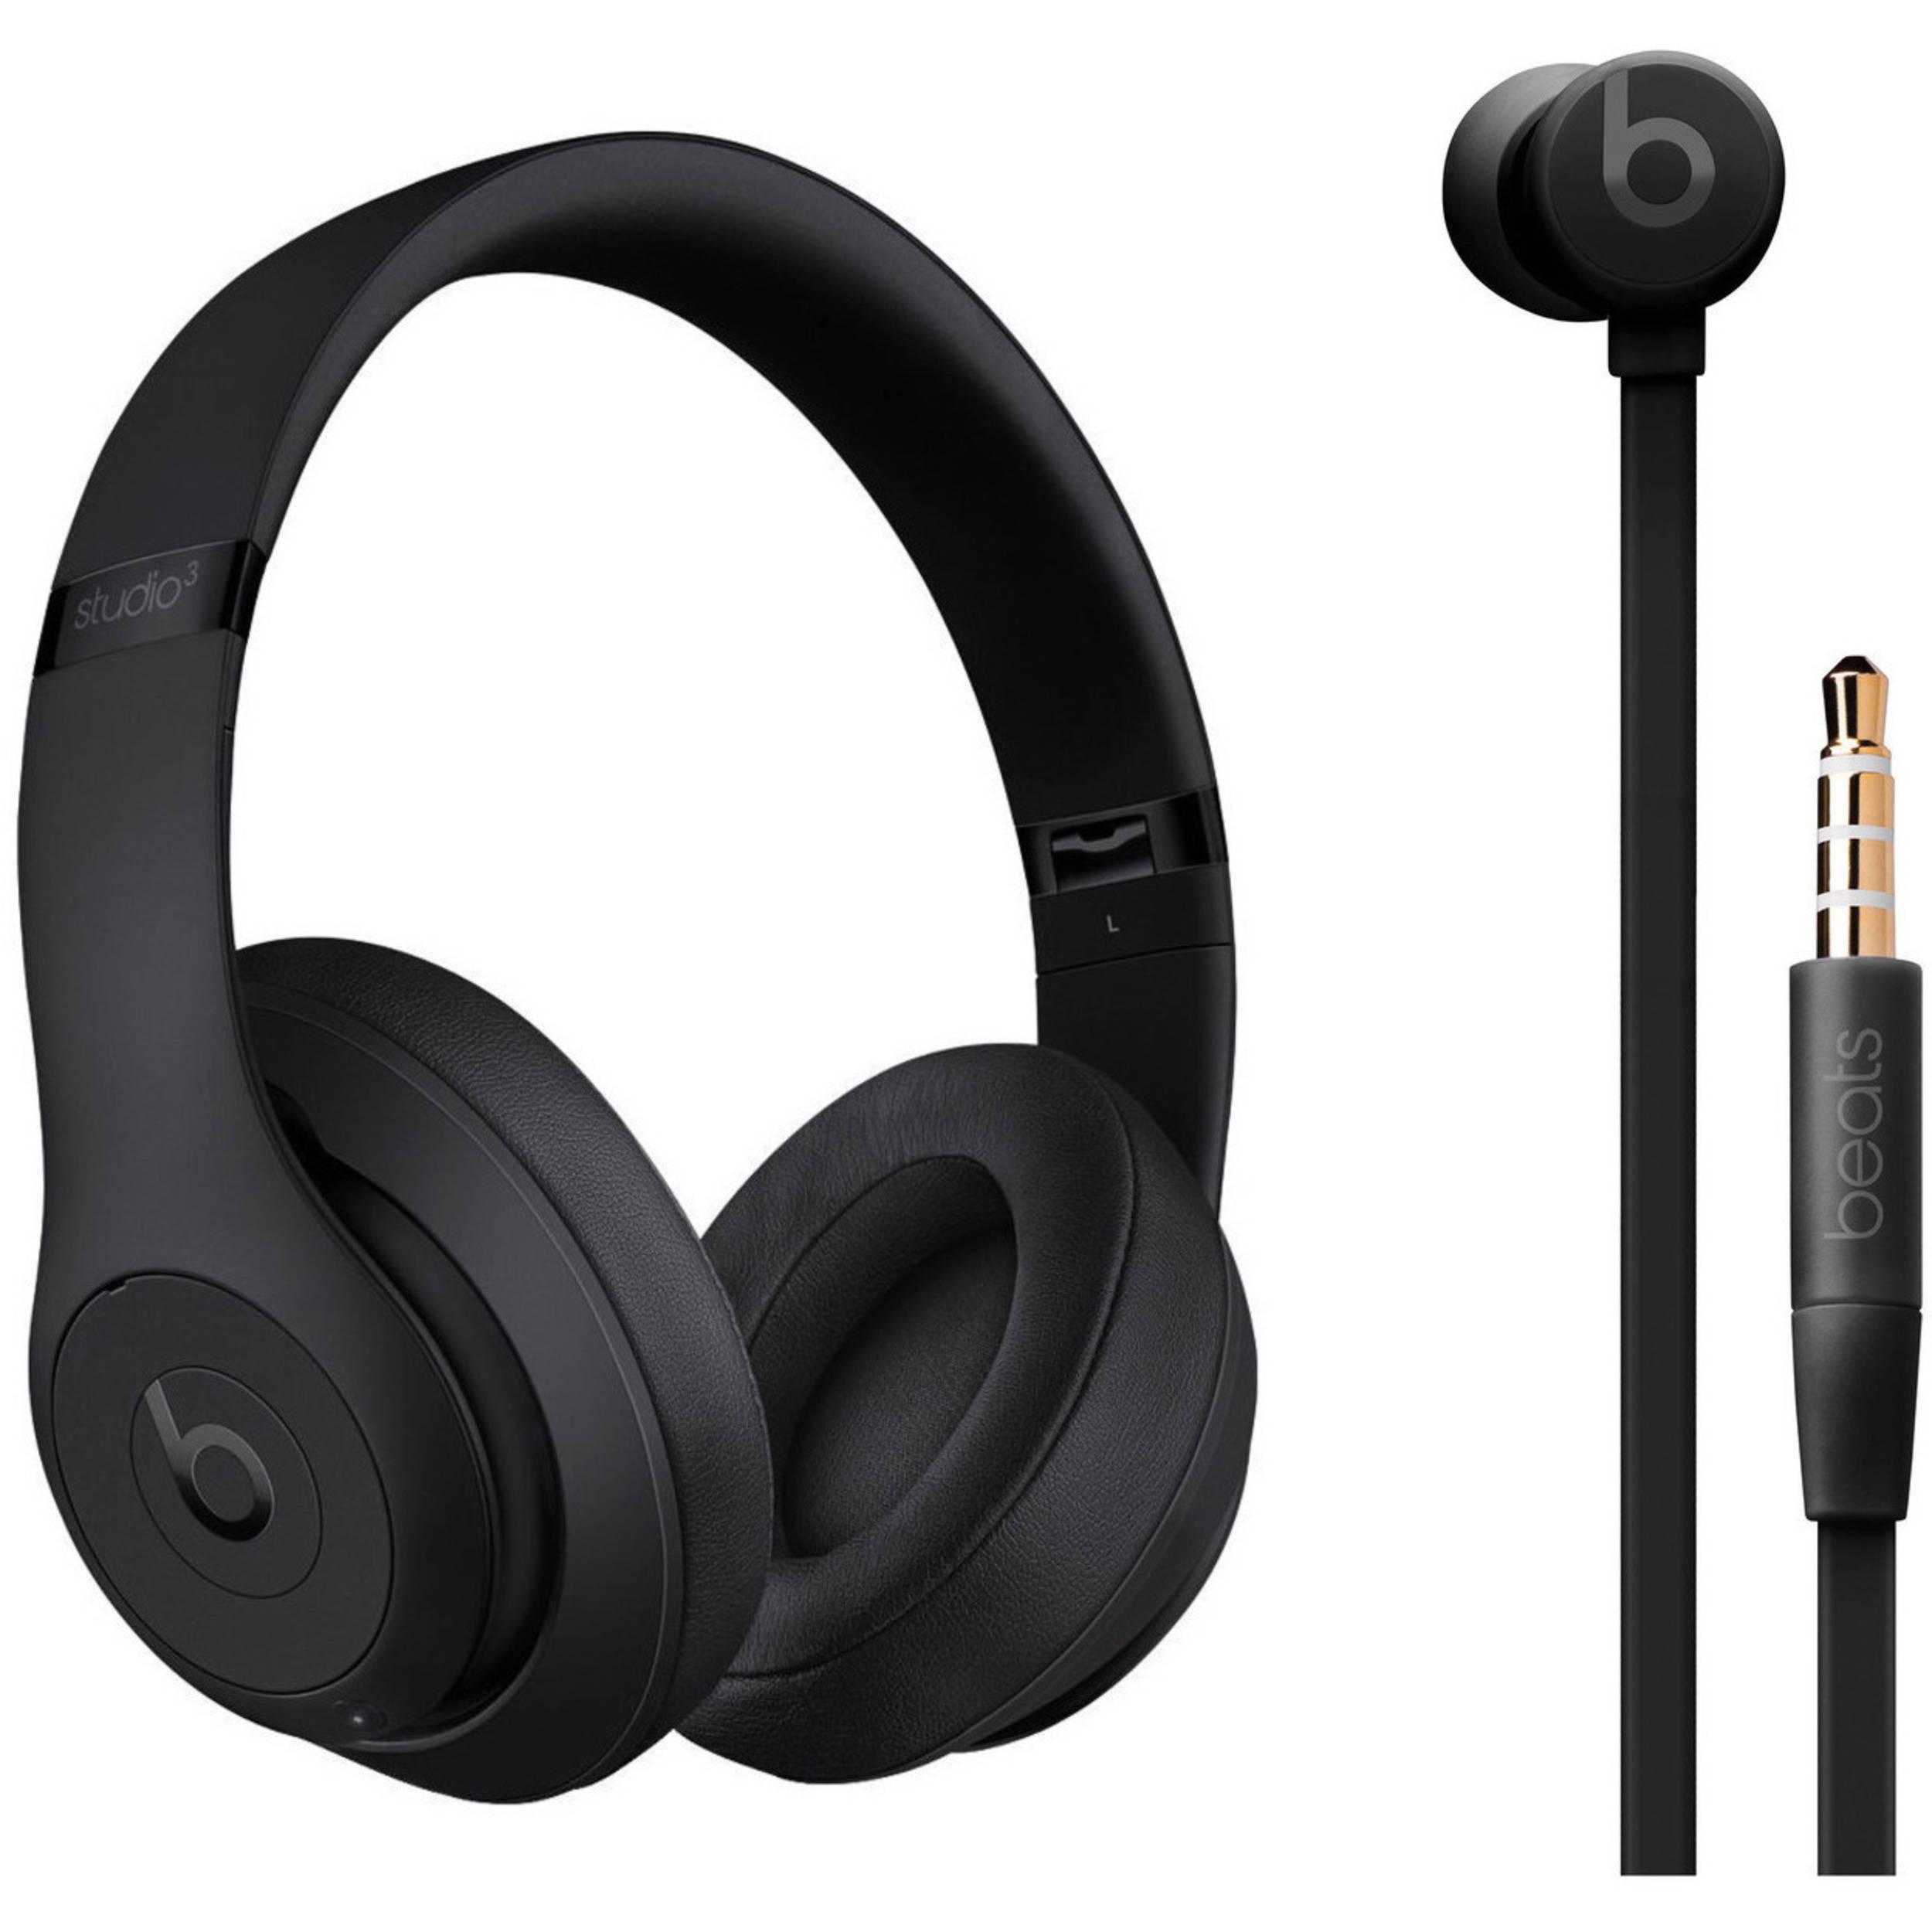 Beats By Dr Dre Studio3 Wireless Noise Canceling Headphones